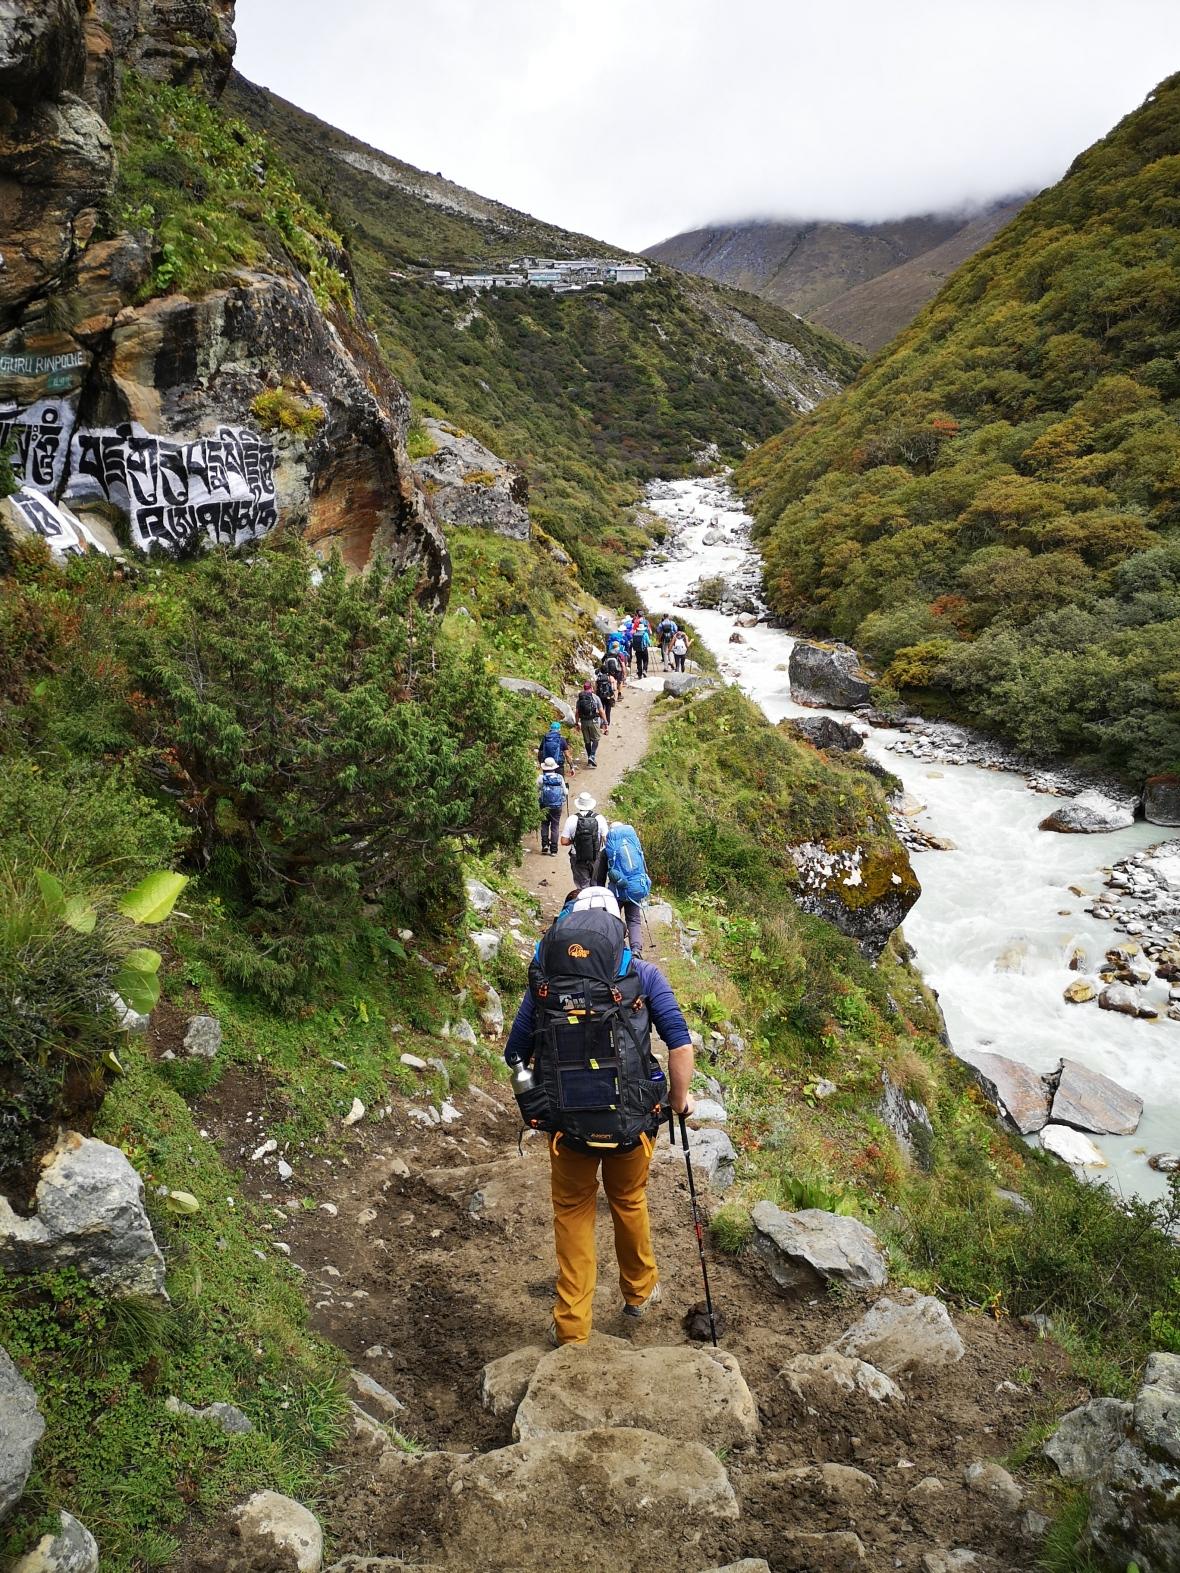 Everest Hike Crowd